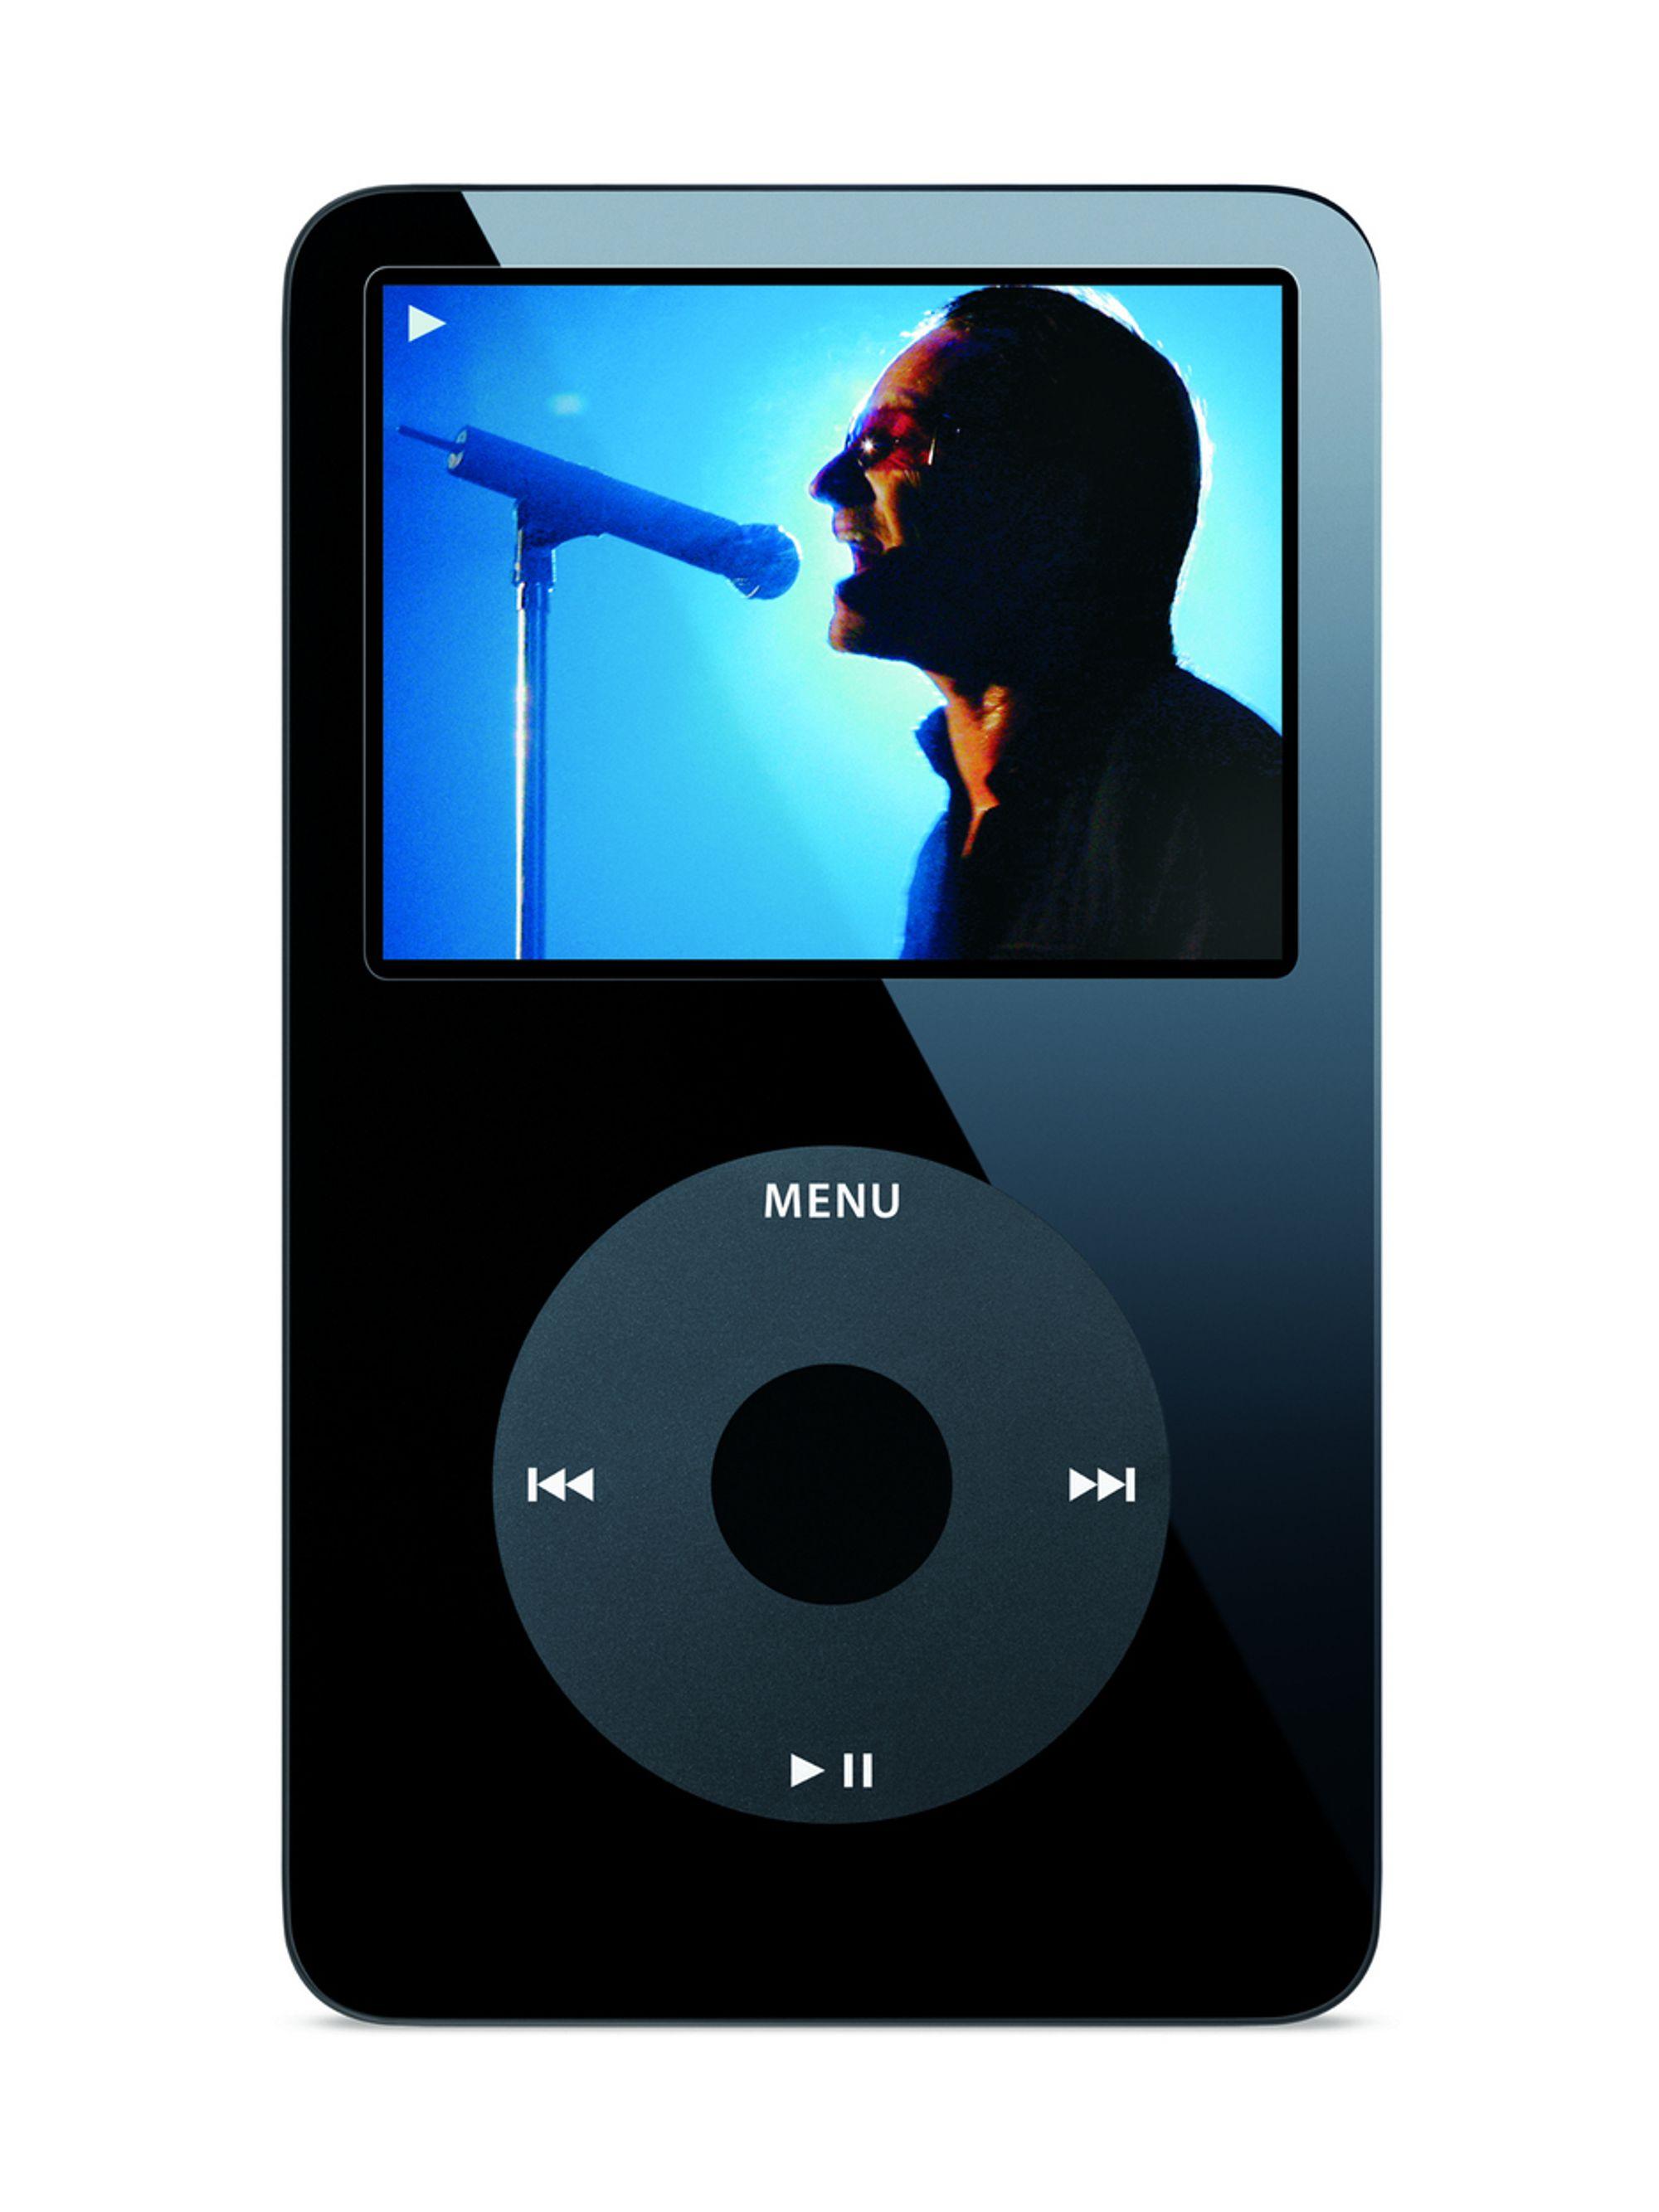 iPod video.